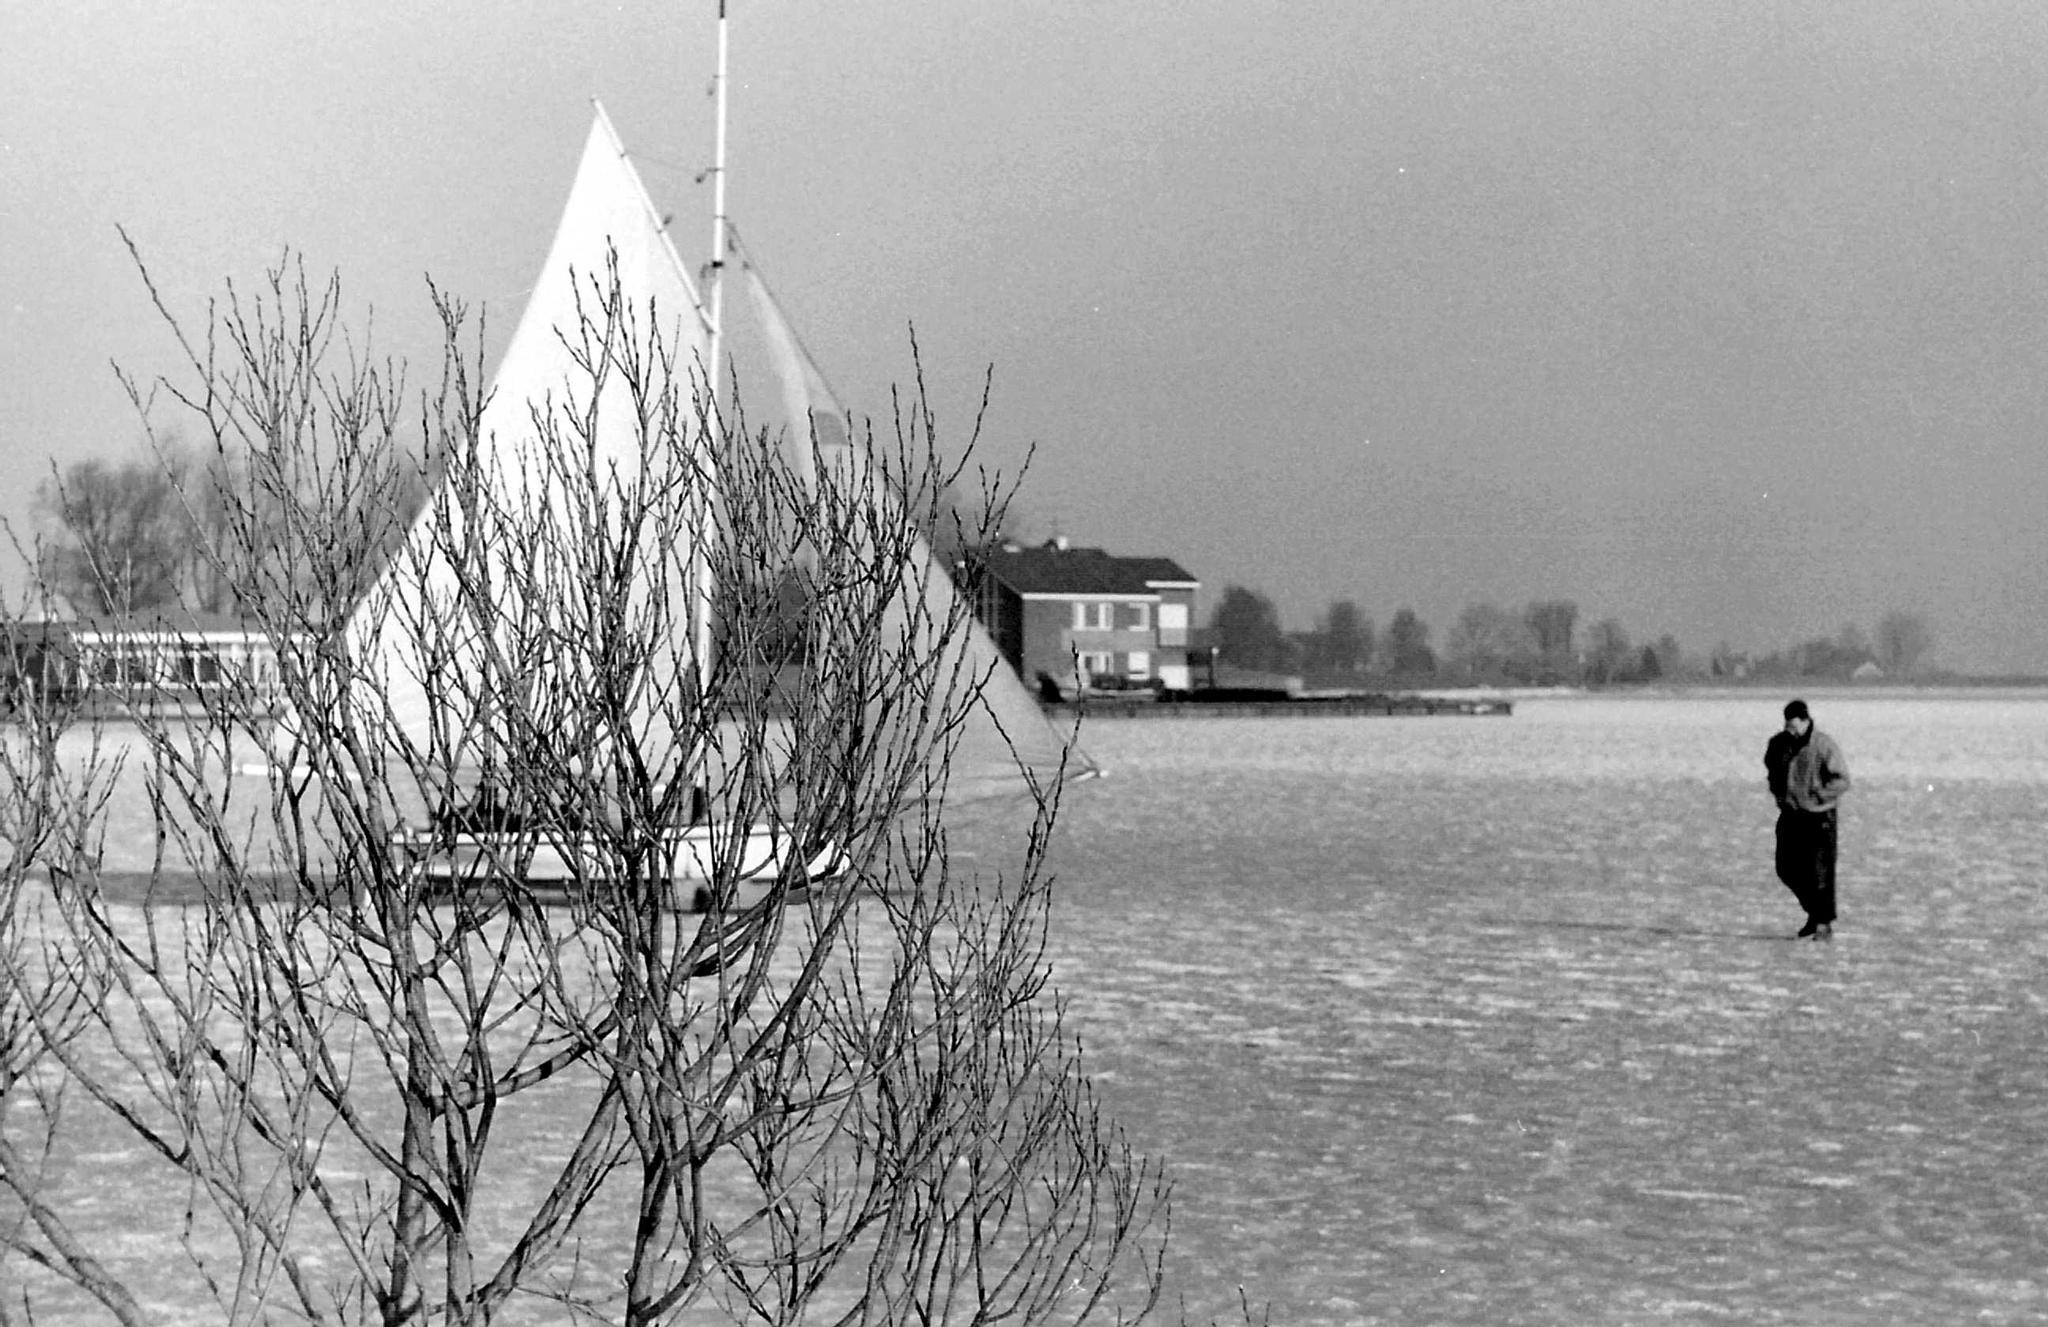 Monnickendam; Ice sailing on Gouwzee by joop.vanklaveren